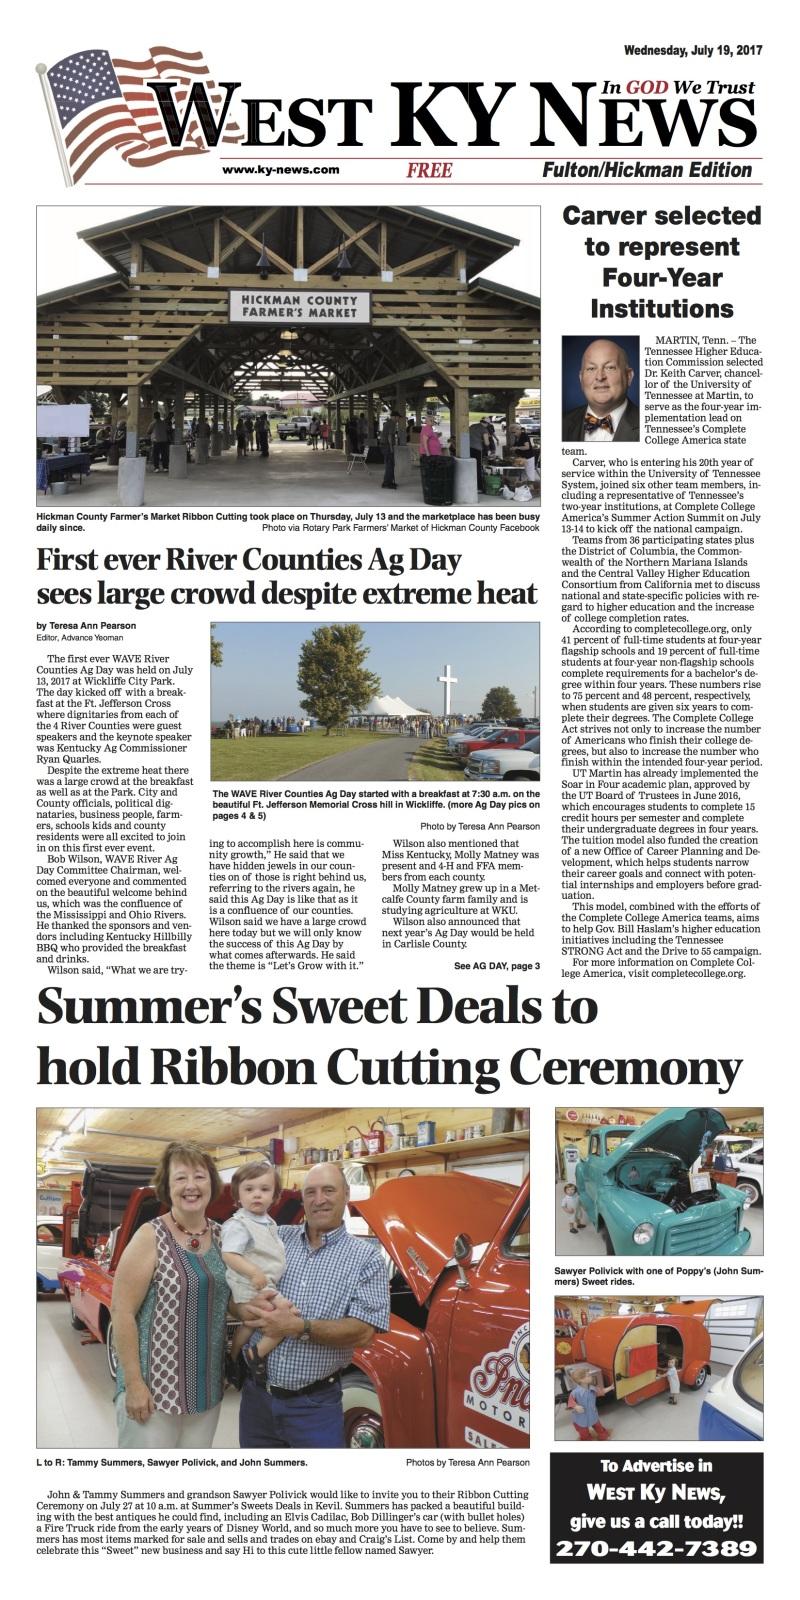 West Kentucky News-Fulton Hickman Edition 7-19-17